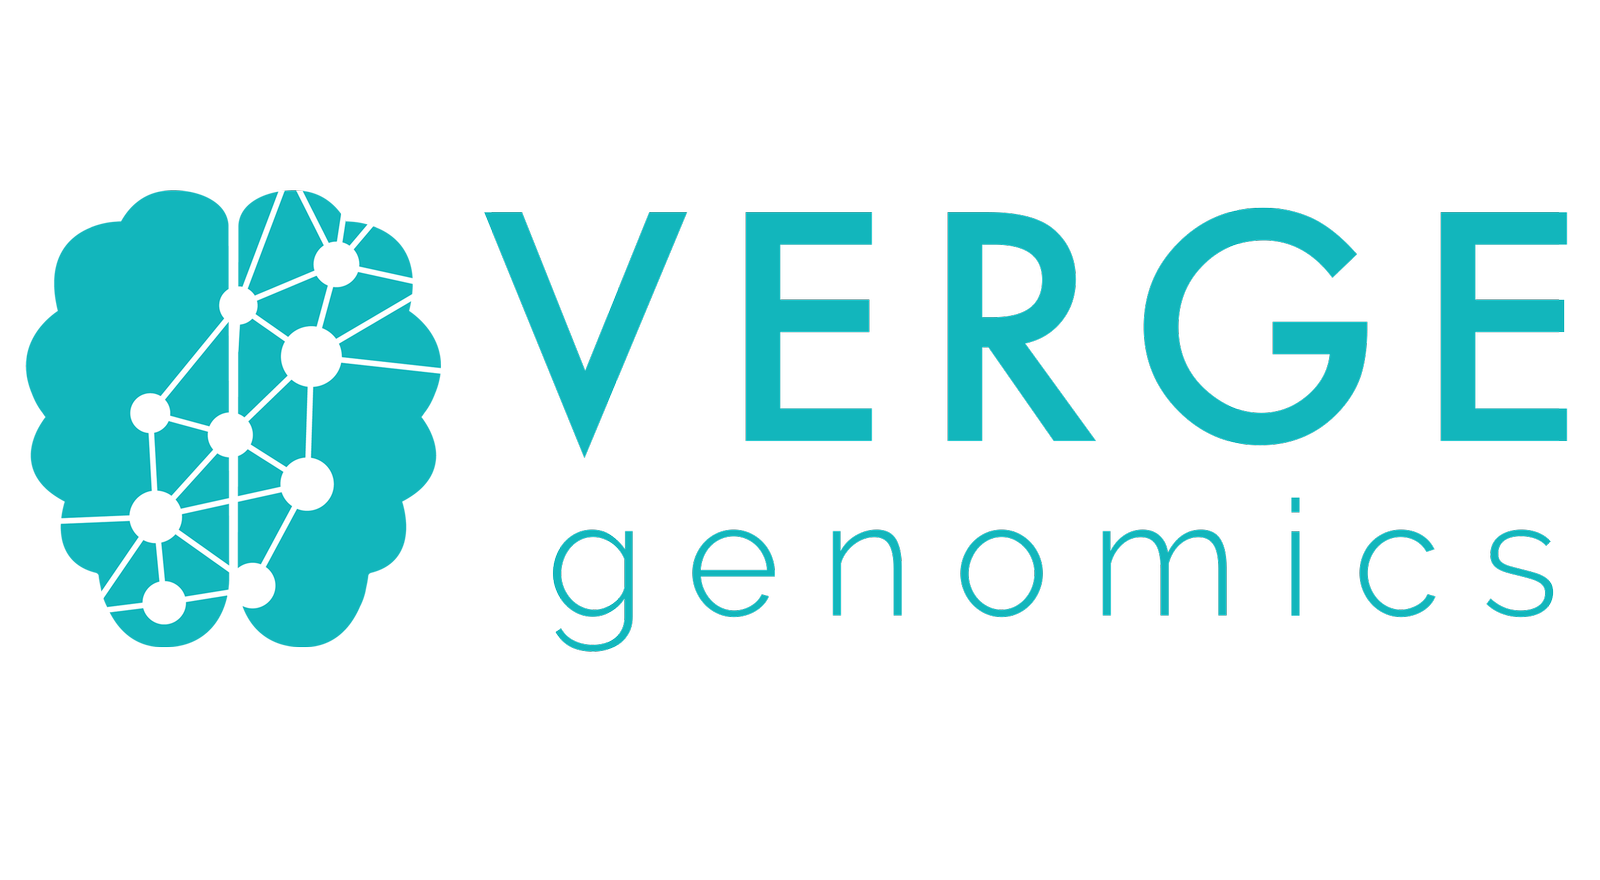 venturebeat.com - Kyle Wiggers - AI drug discovery startup Verge Genomics raises $32 million